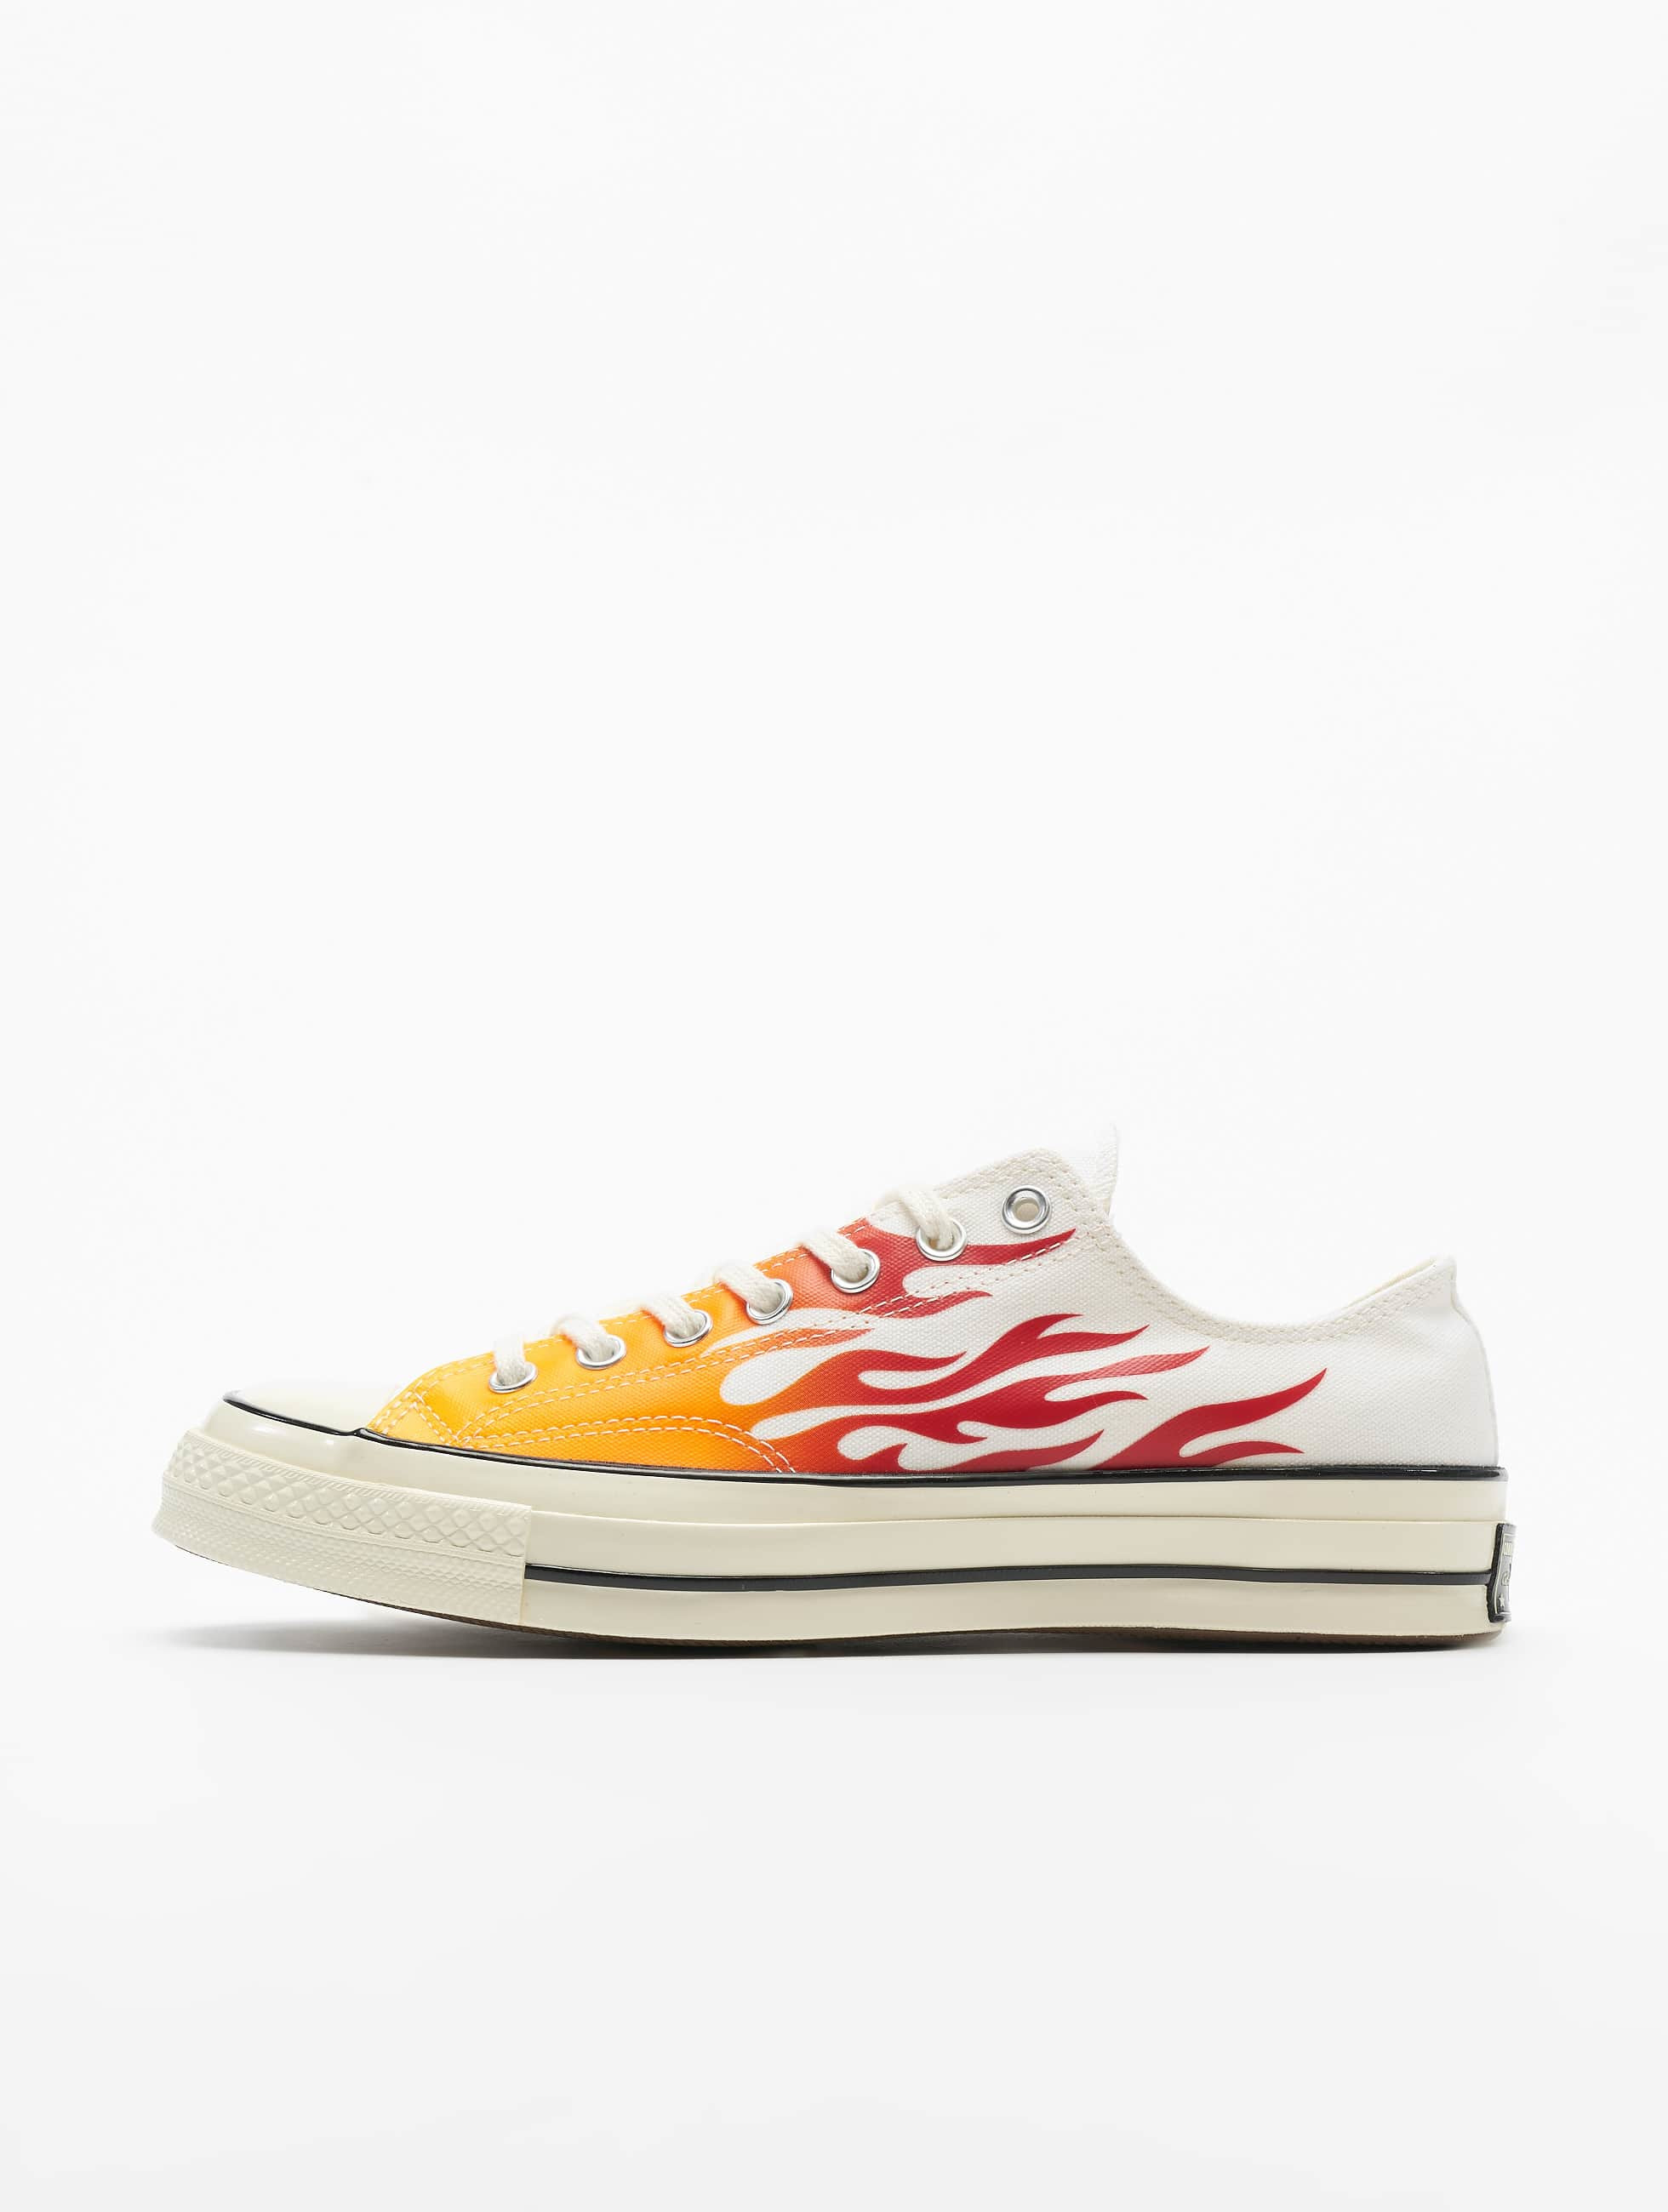 Sneakers WhiteEnamel Converse Prints Mandarin RedBold